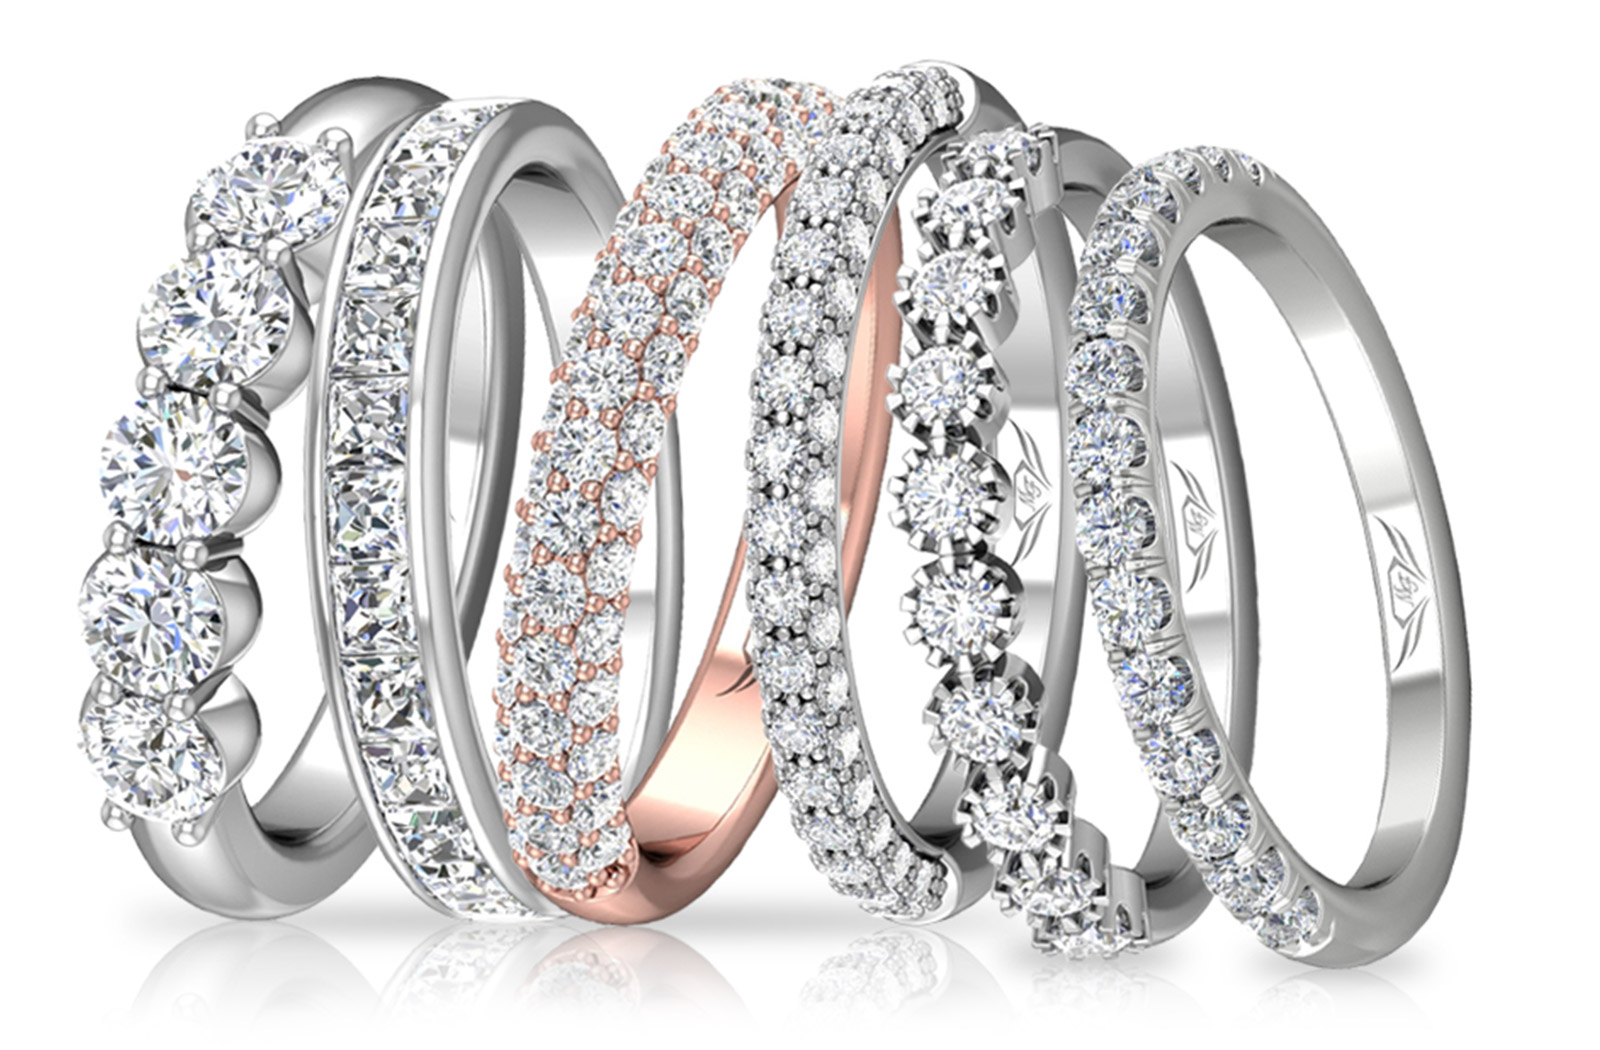 anniversary rings dallas texas - custom diamond rings dallas